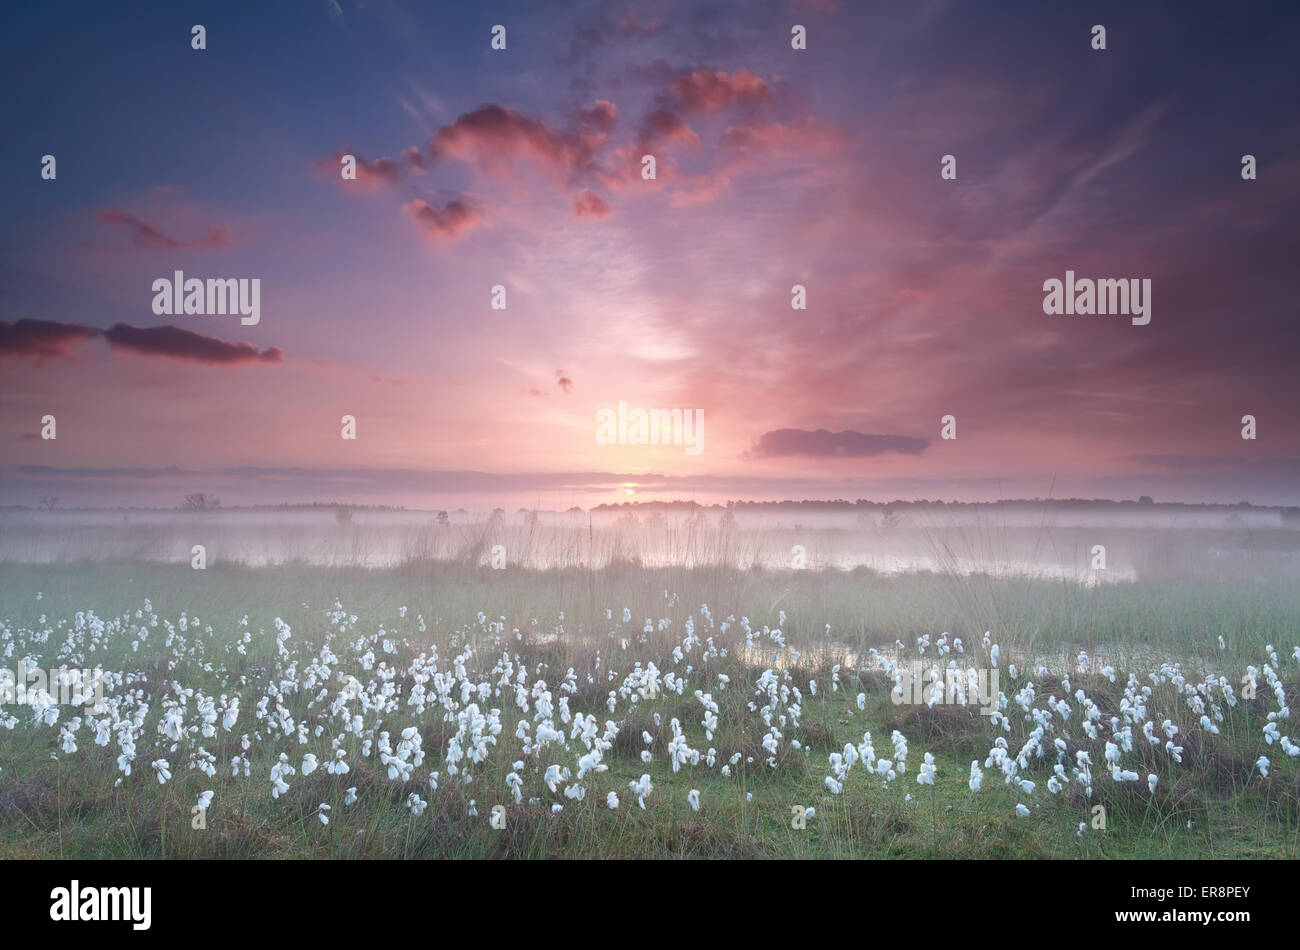 misty sunrise over swamp with cottongrass, Kampina, North Brabant, Netherlands - Stock Image